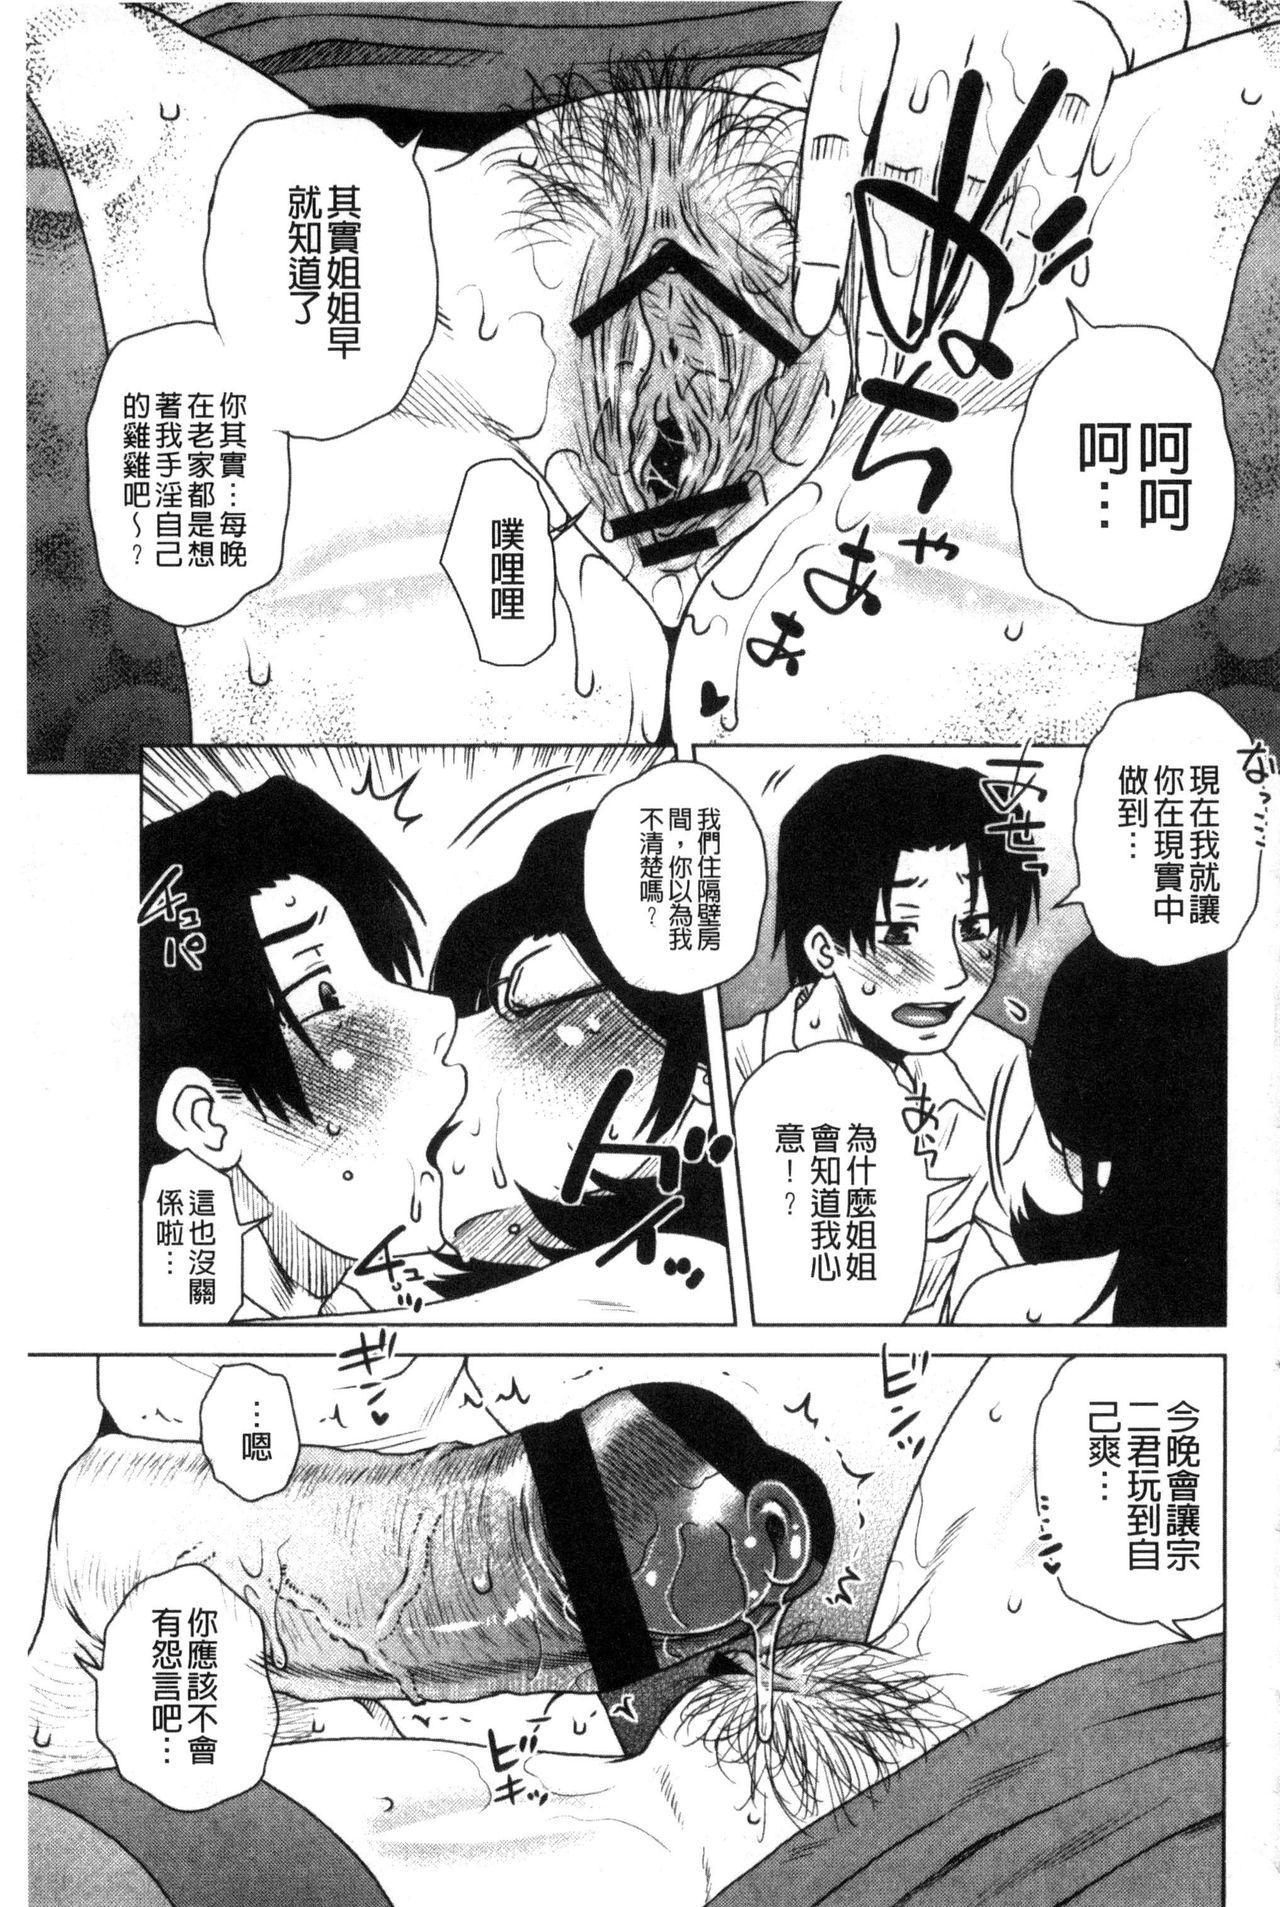 [Kurumiya Mashimin] Uchi no Shachou no Hamedere Inkatsu - Our President is HAME-DERE in Licentious sex life. [Chinese] 57